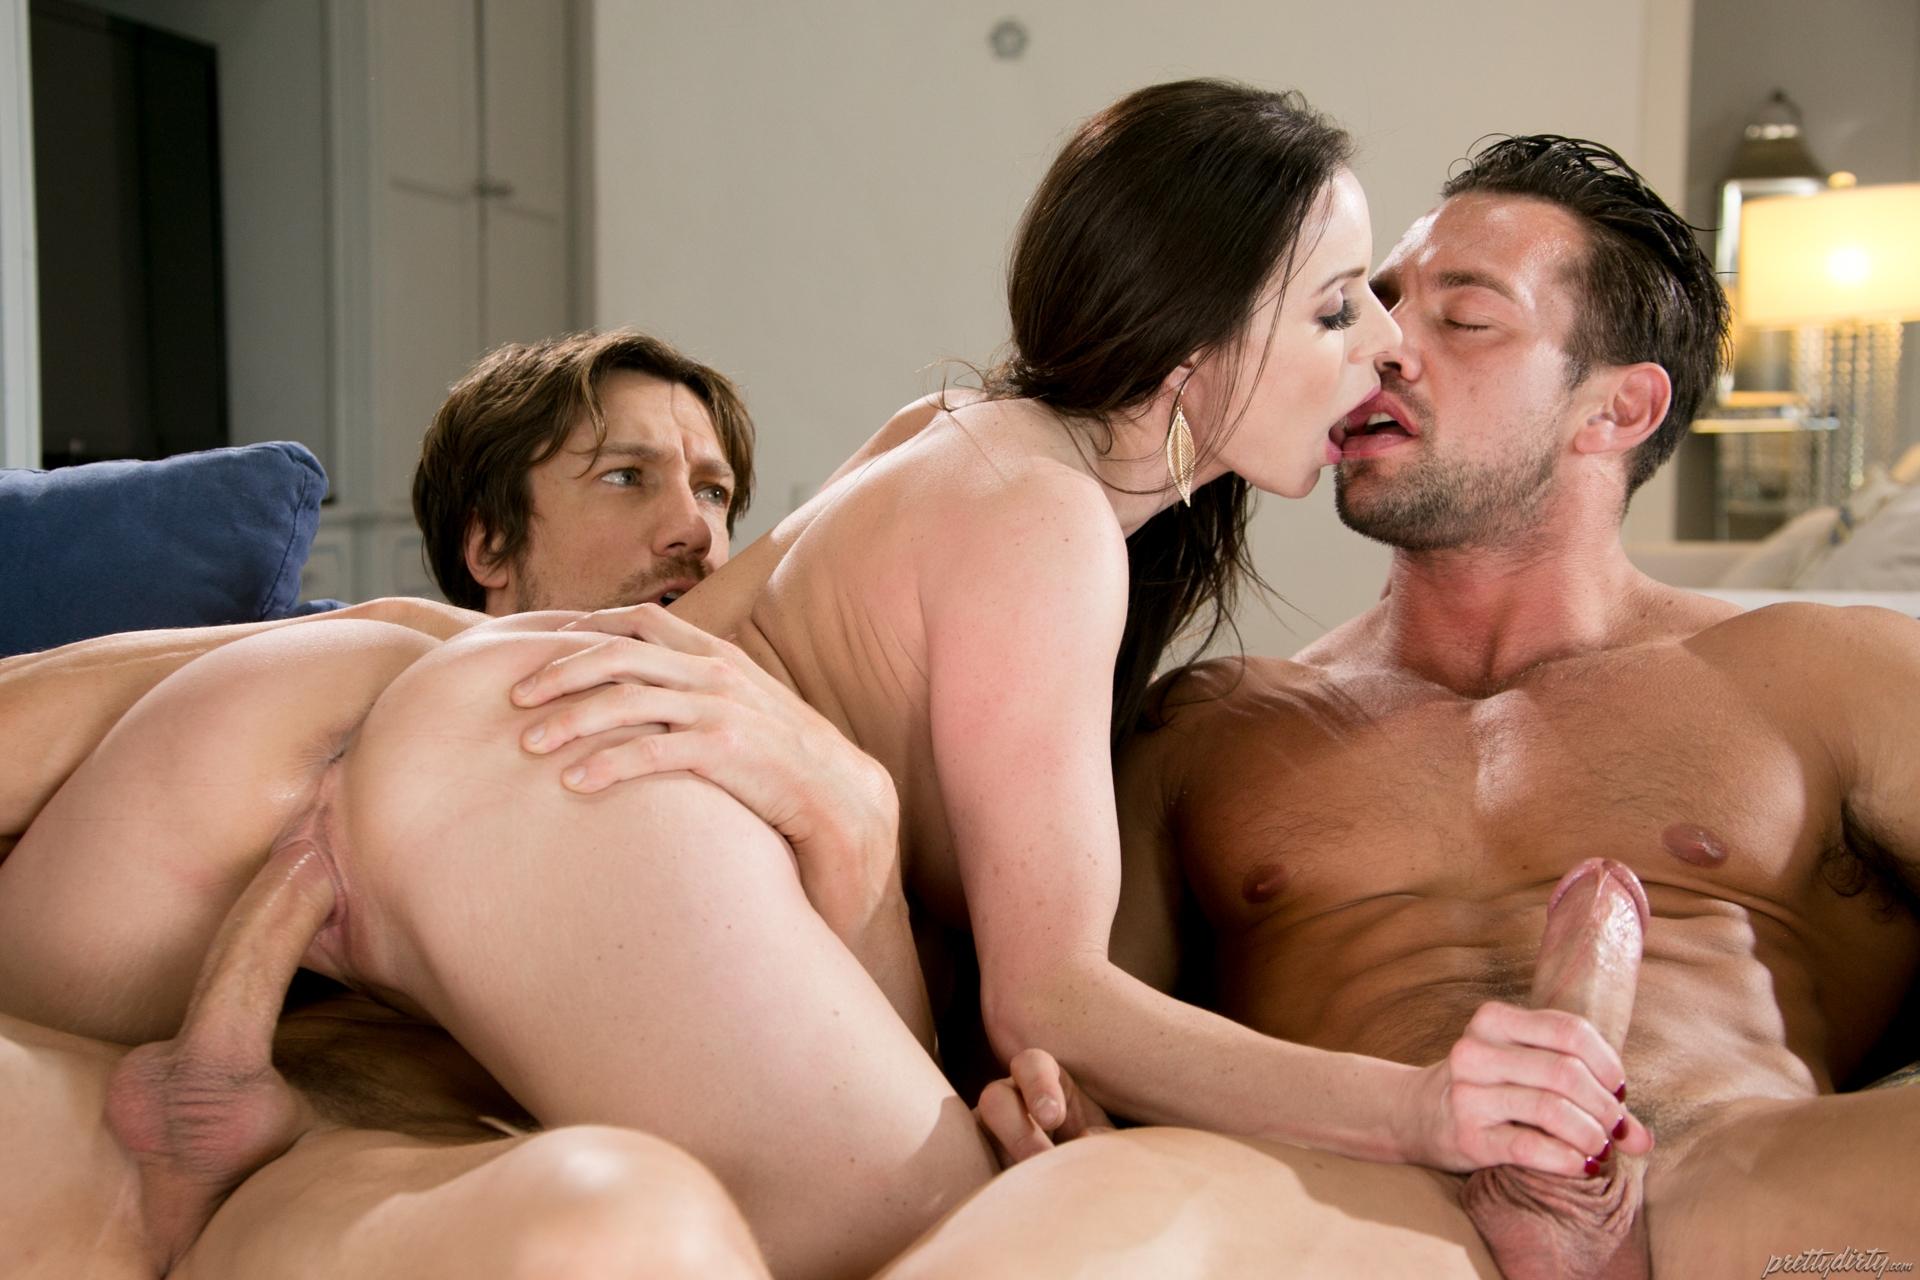 Kendra lust's porn pics